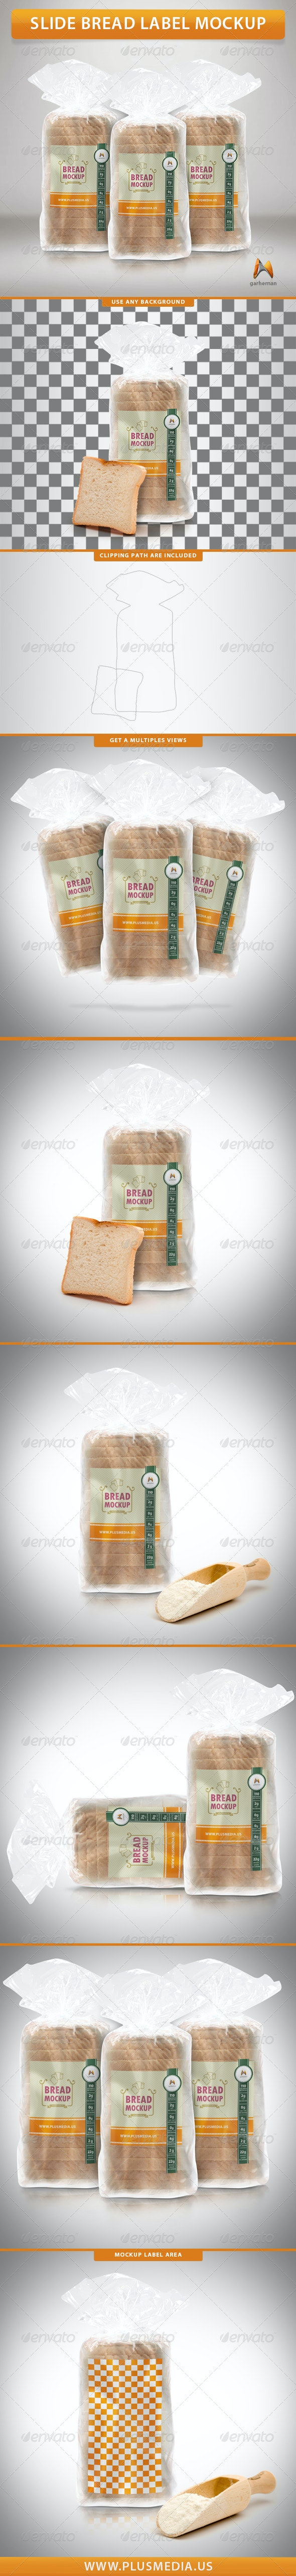 Slide Bread Label Mockup - Food and Drink Packaging